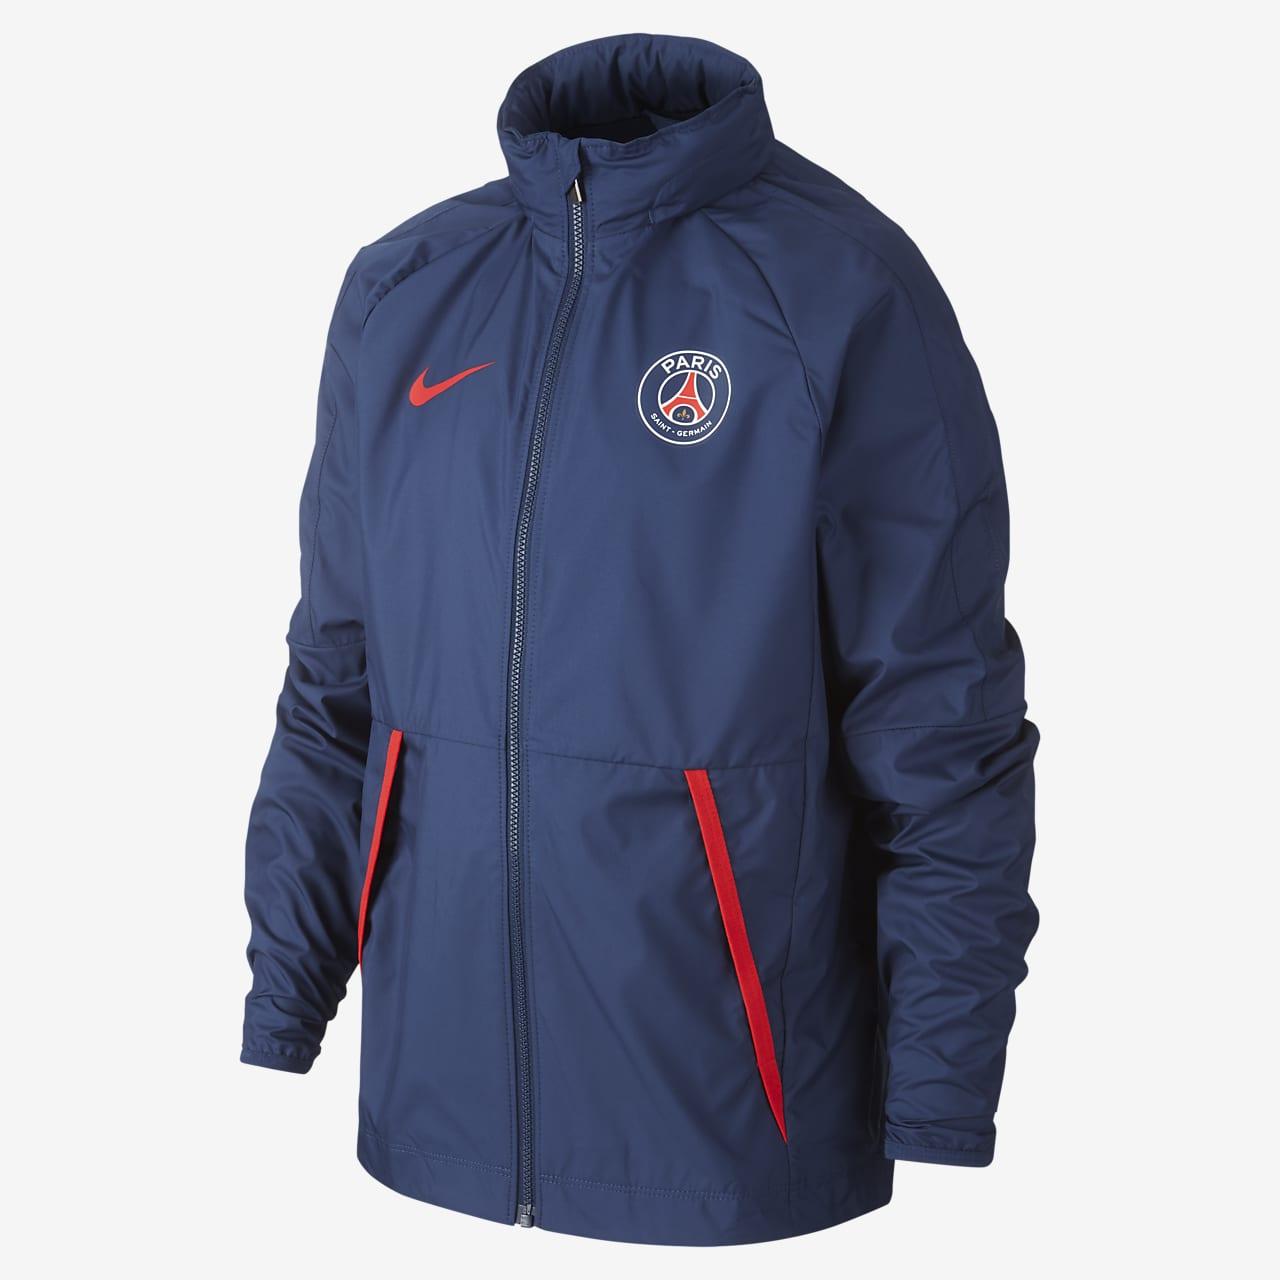 Paris Saint-Germain Older Kids' Football Jacket